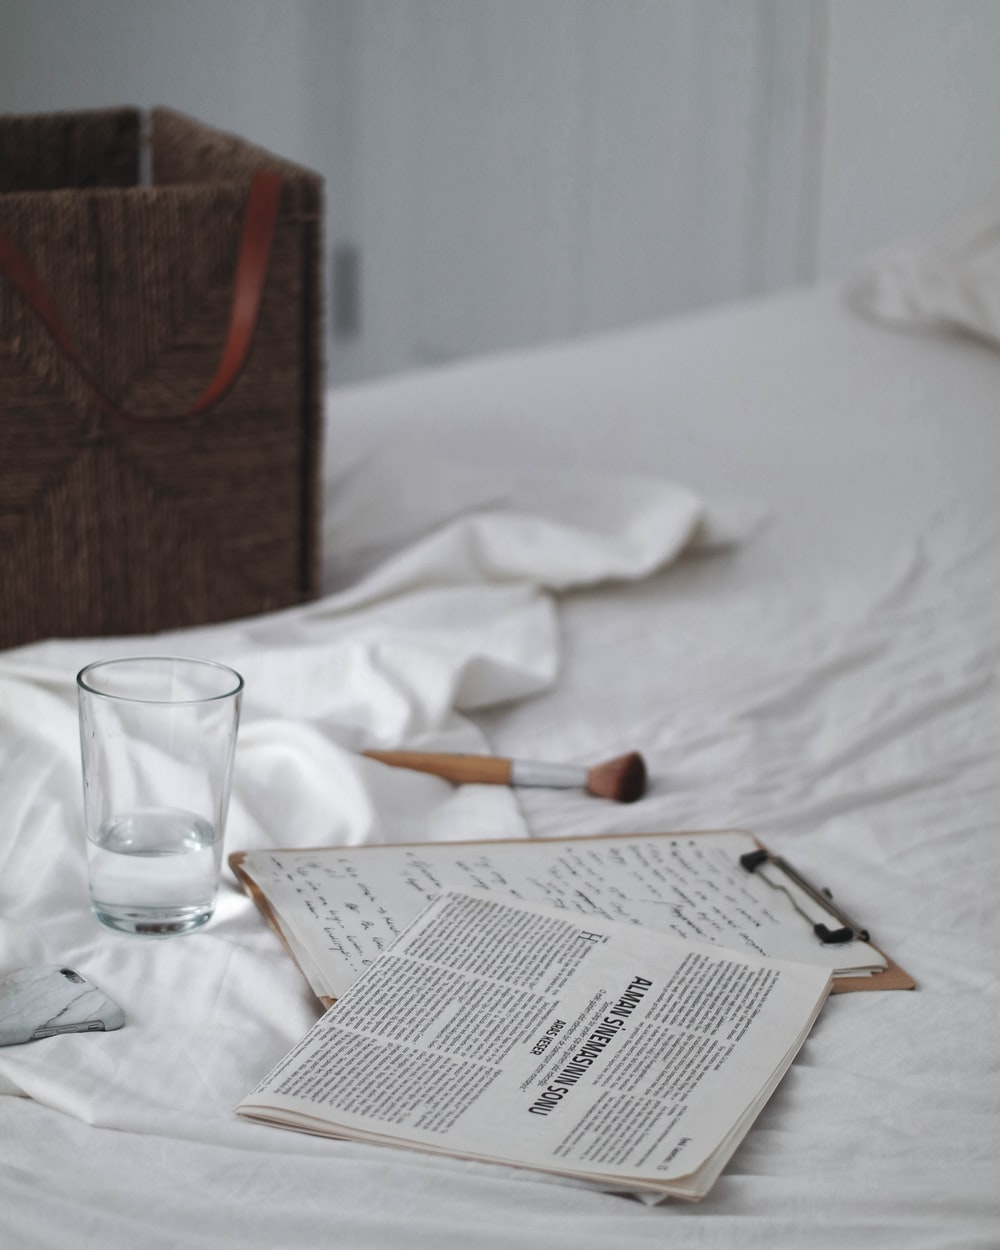 drinking glass beside clipboard on bed